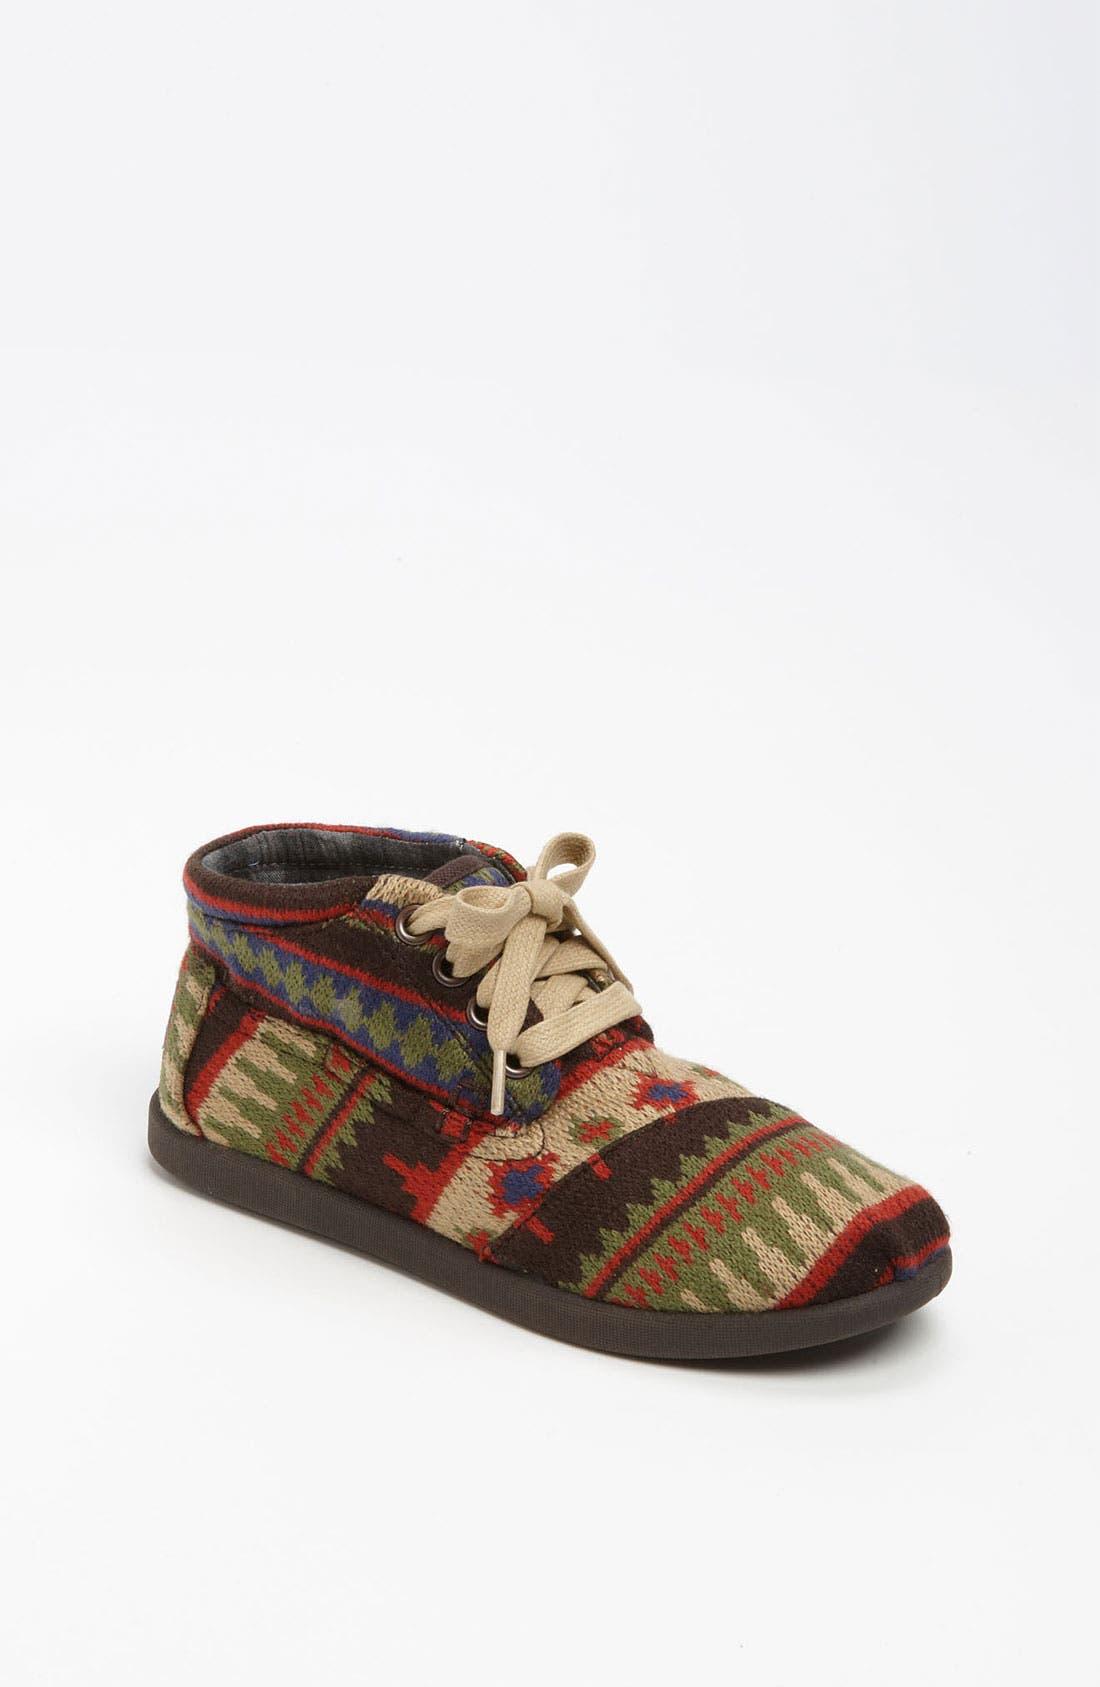 Alternate Image 1 Selected - TOMS 'Botas Youth - Kilim' Boot (Toddler, Little Kid & Big Kid)